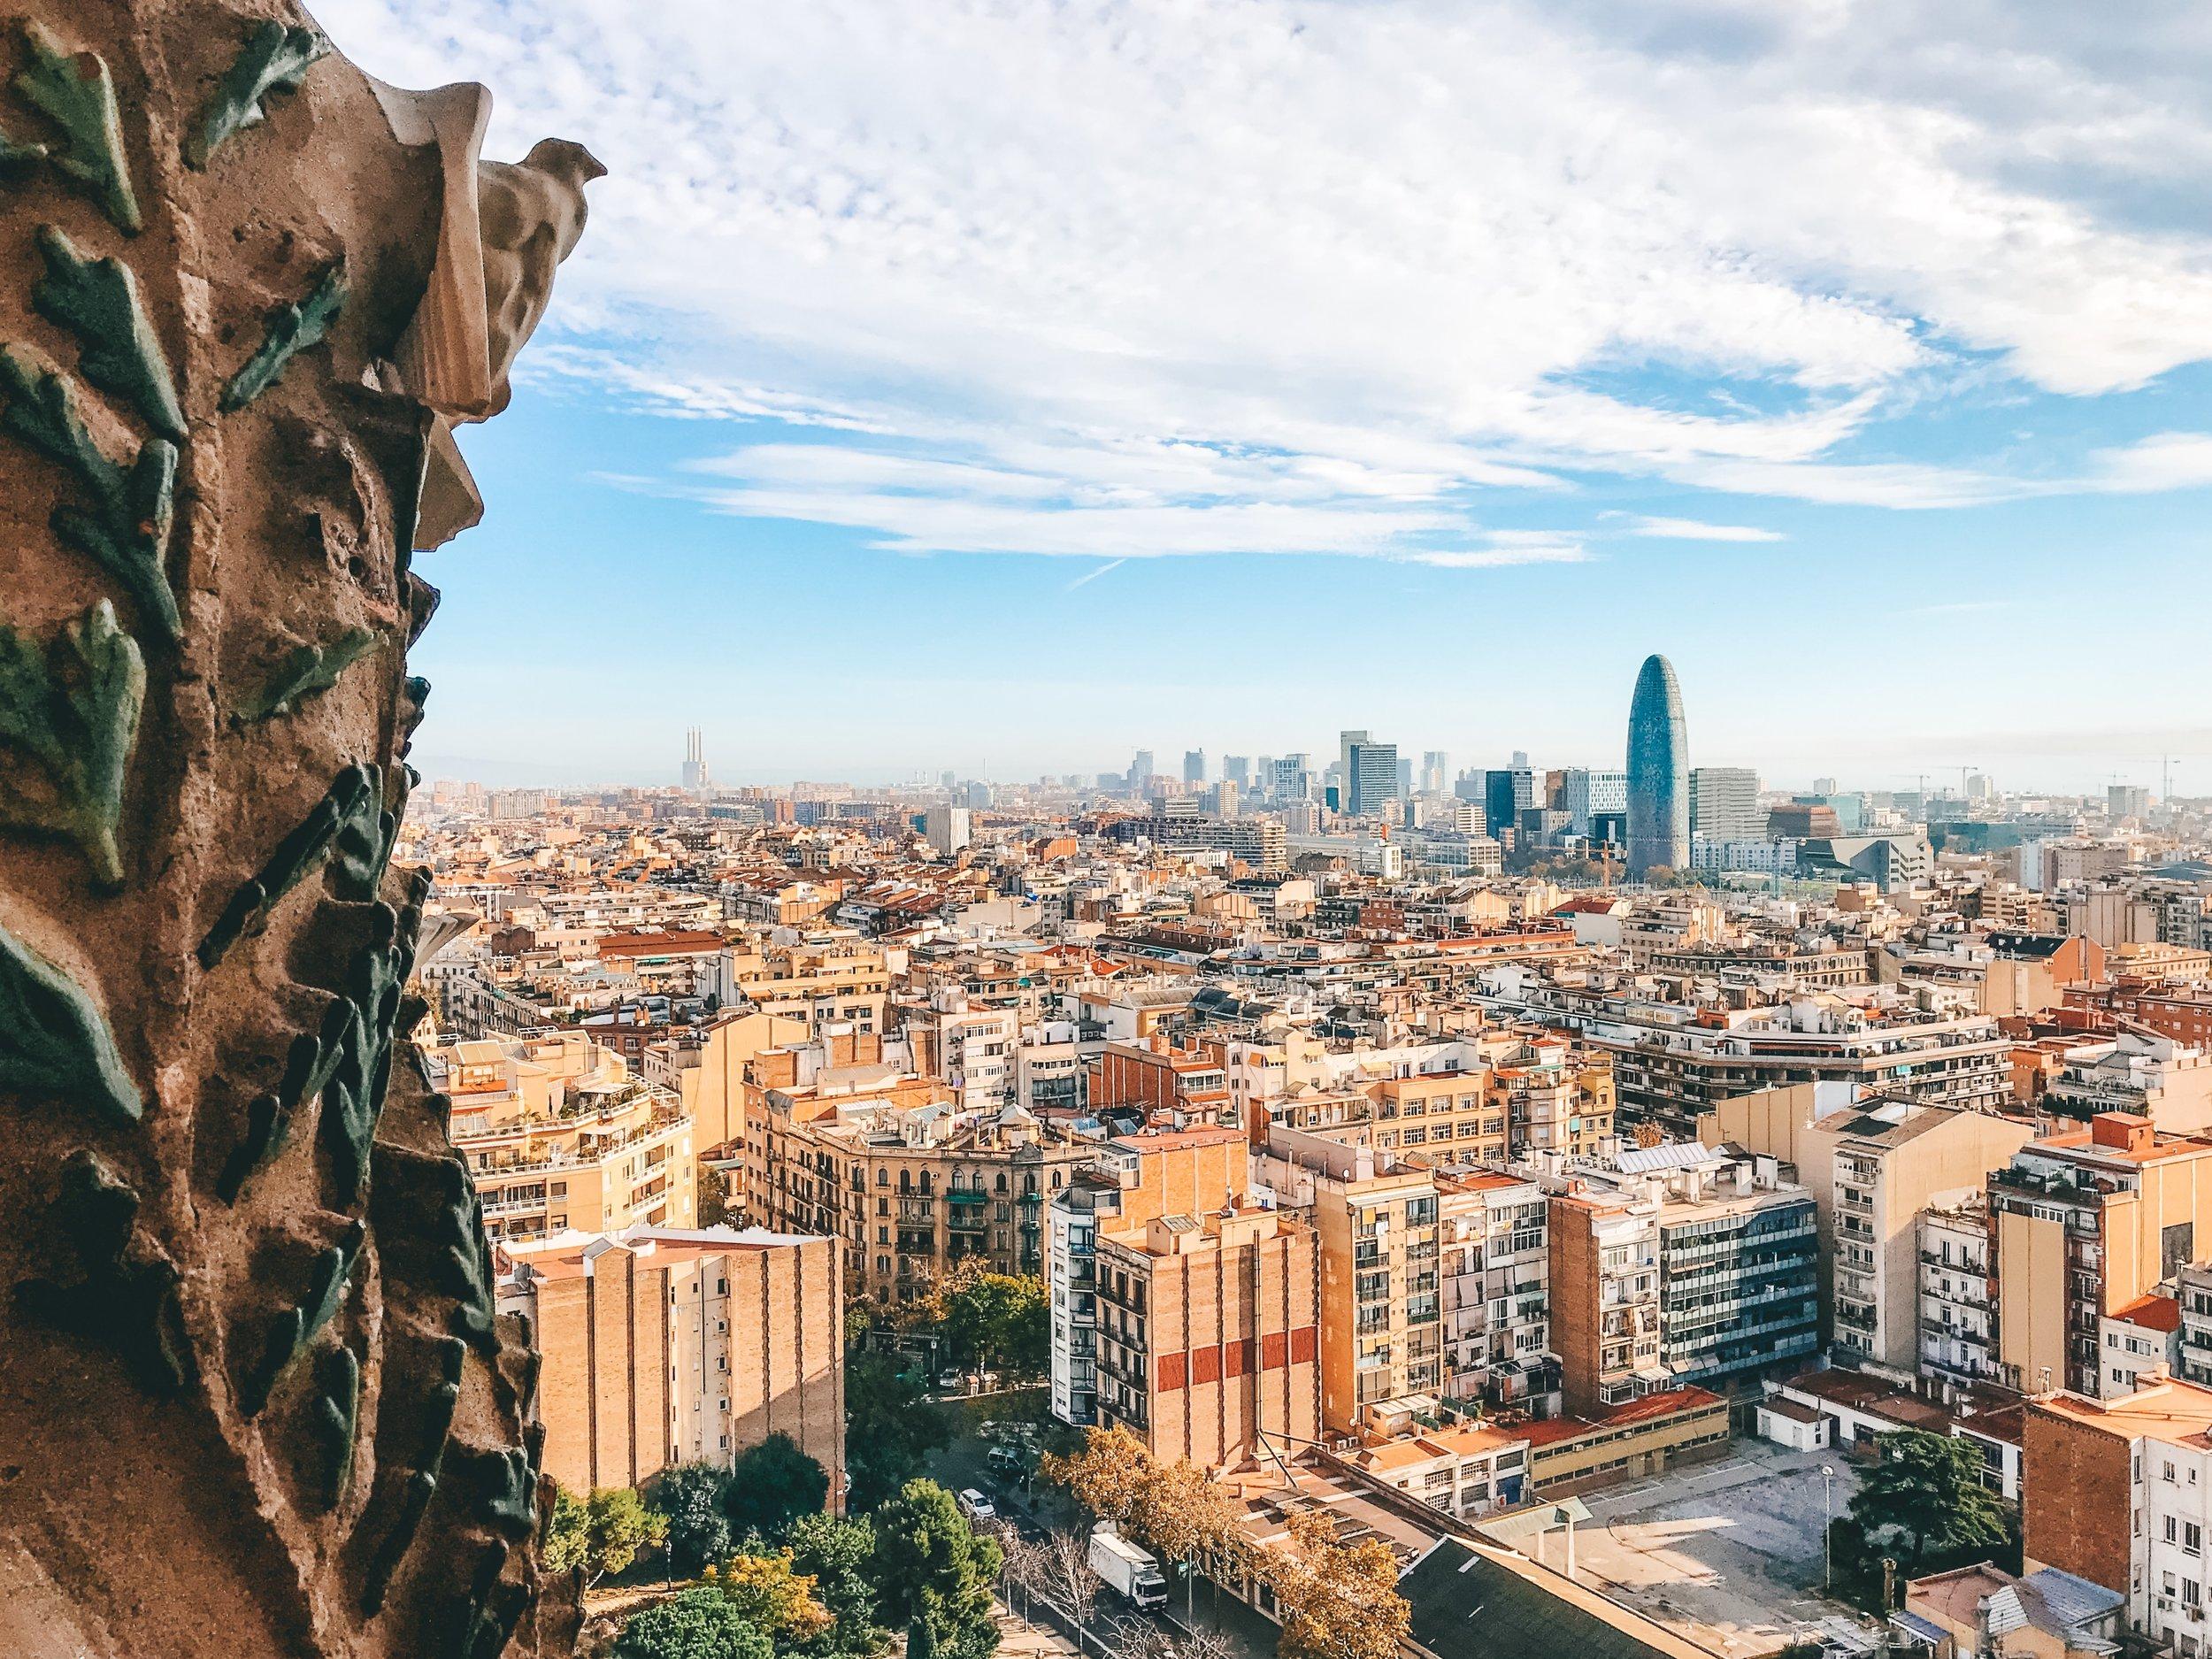 View from the Sagrada Familia - Barcelona